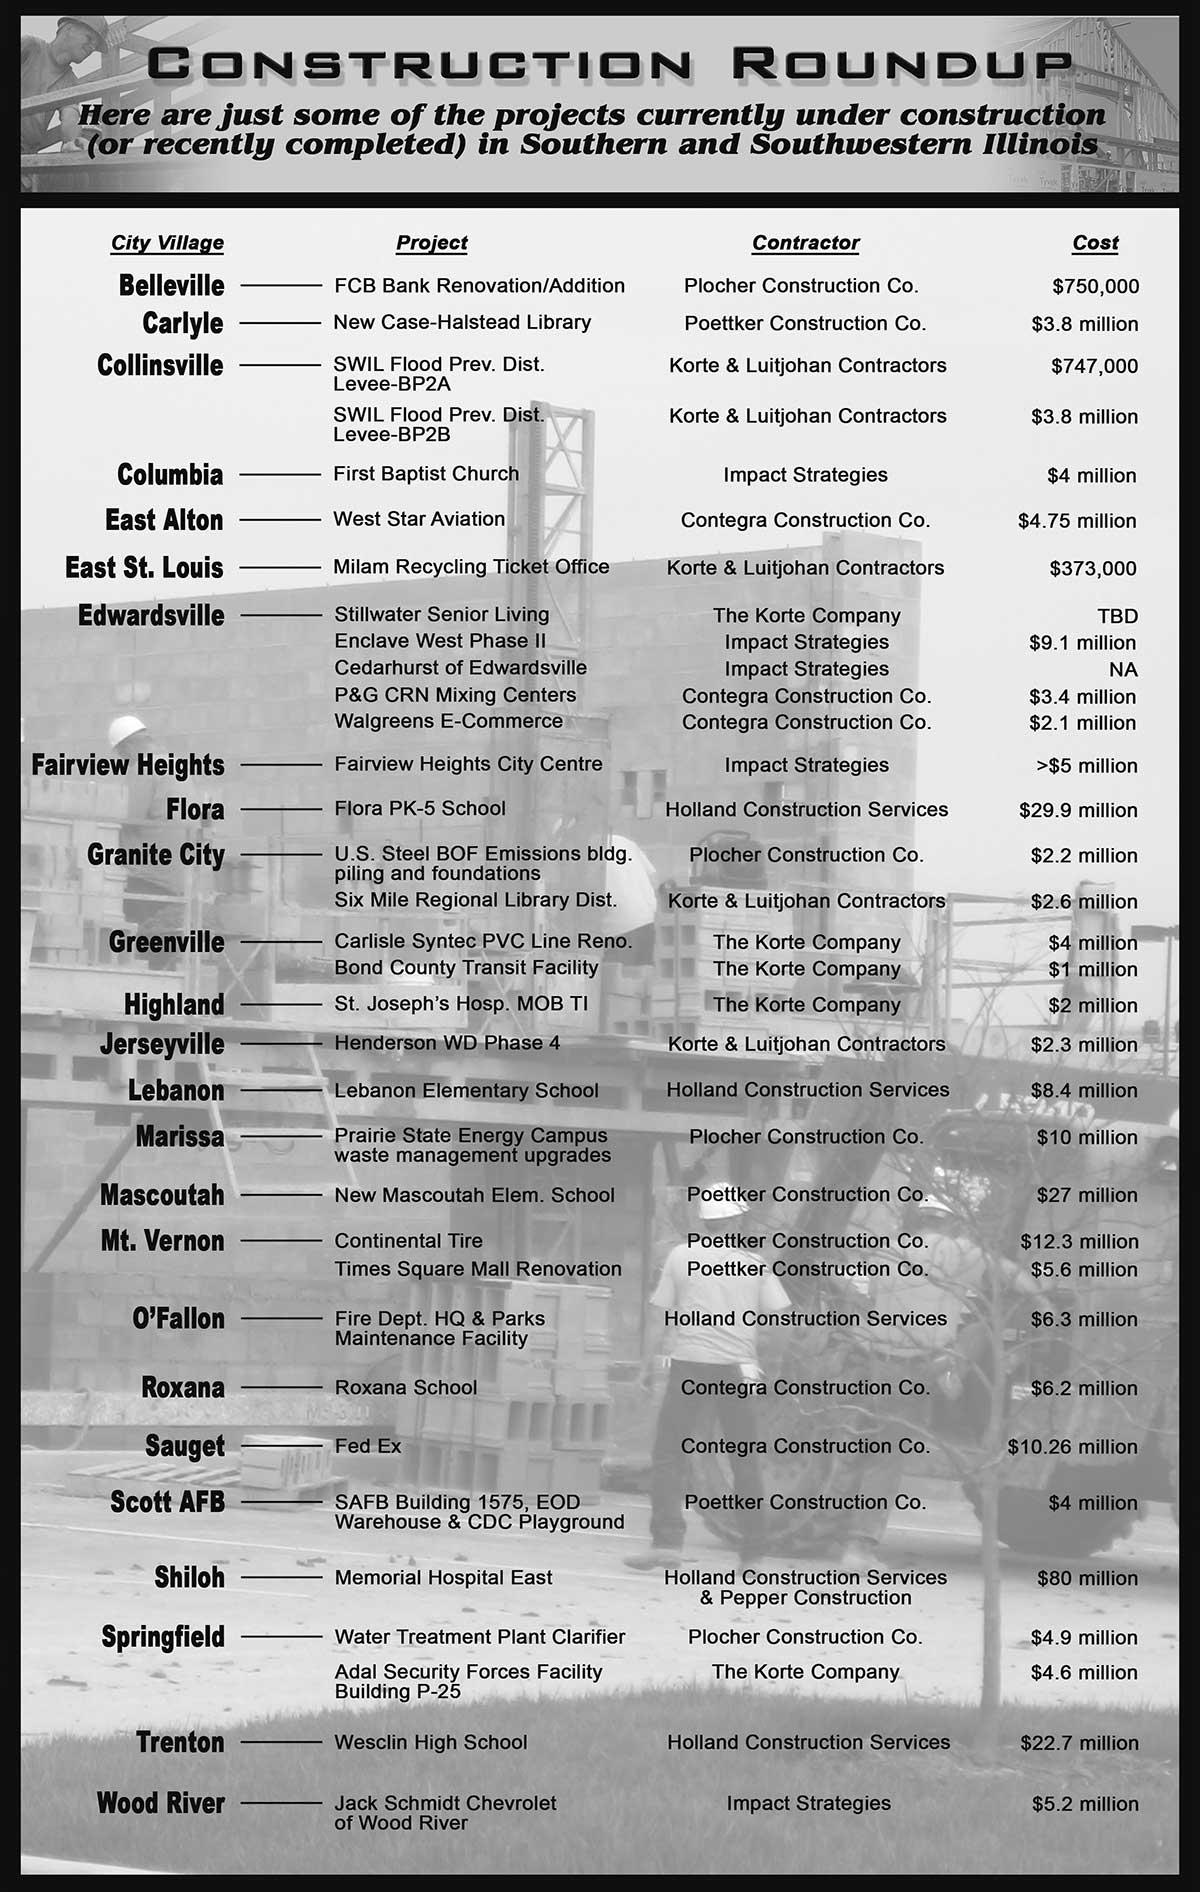 IBJ Apr14 Page 16 Image 0001